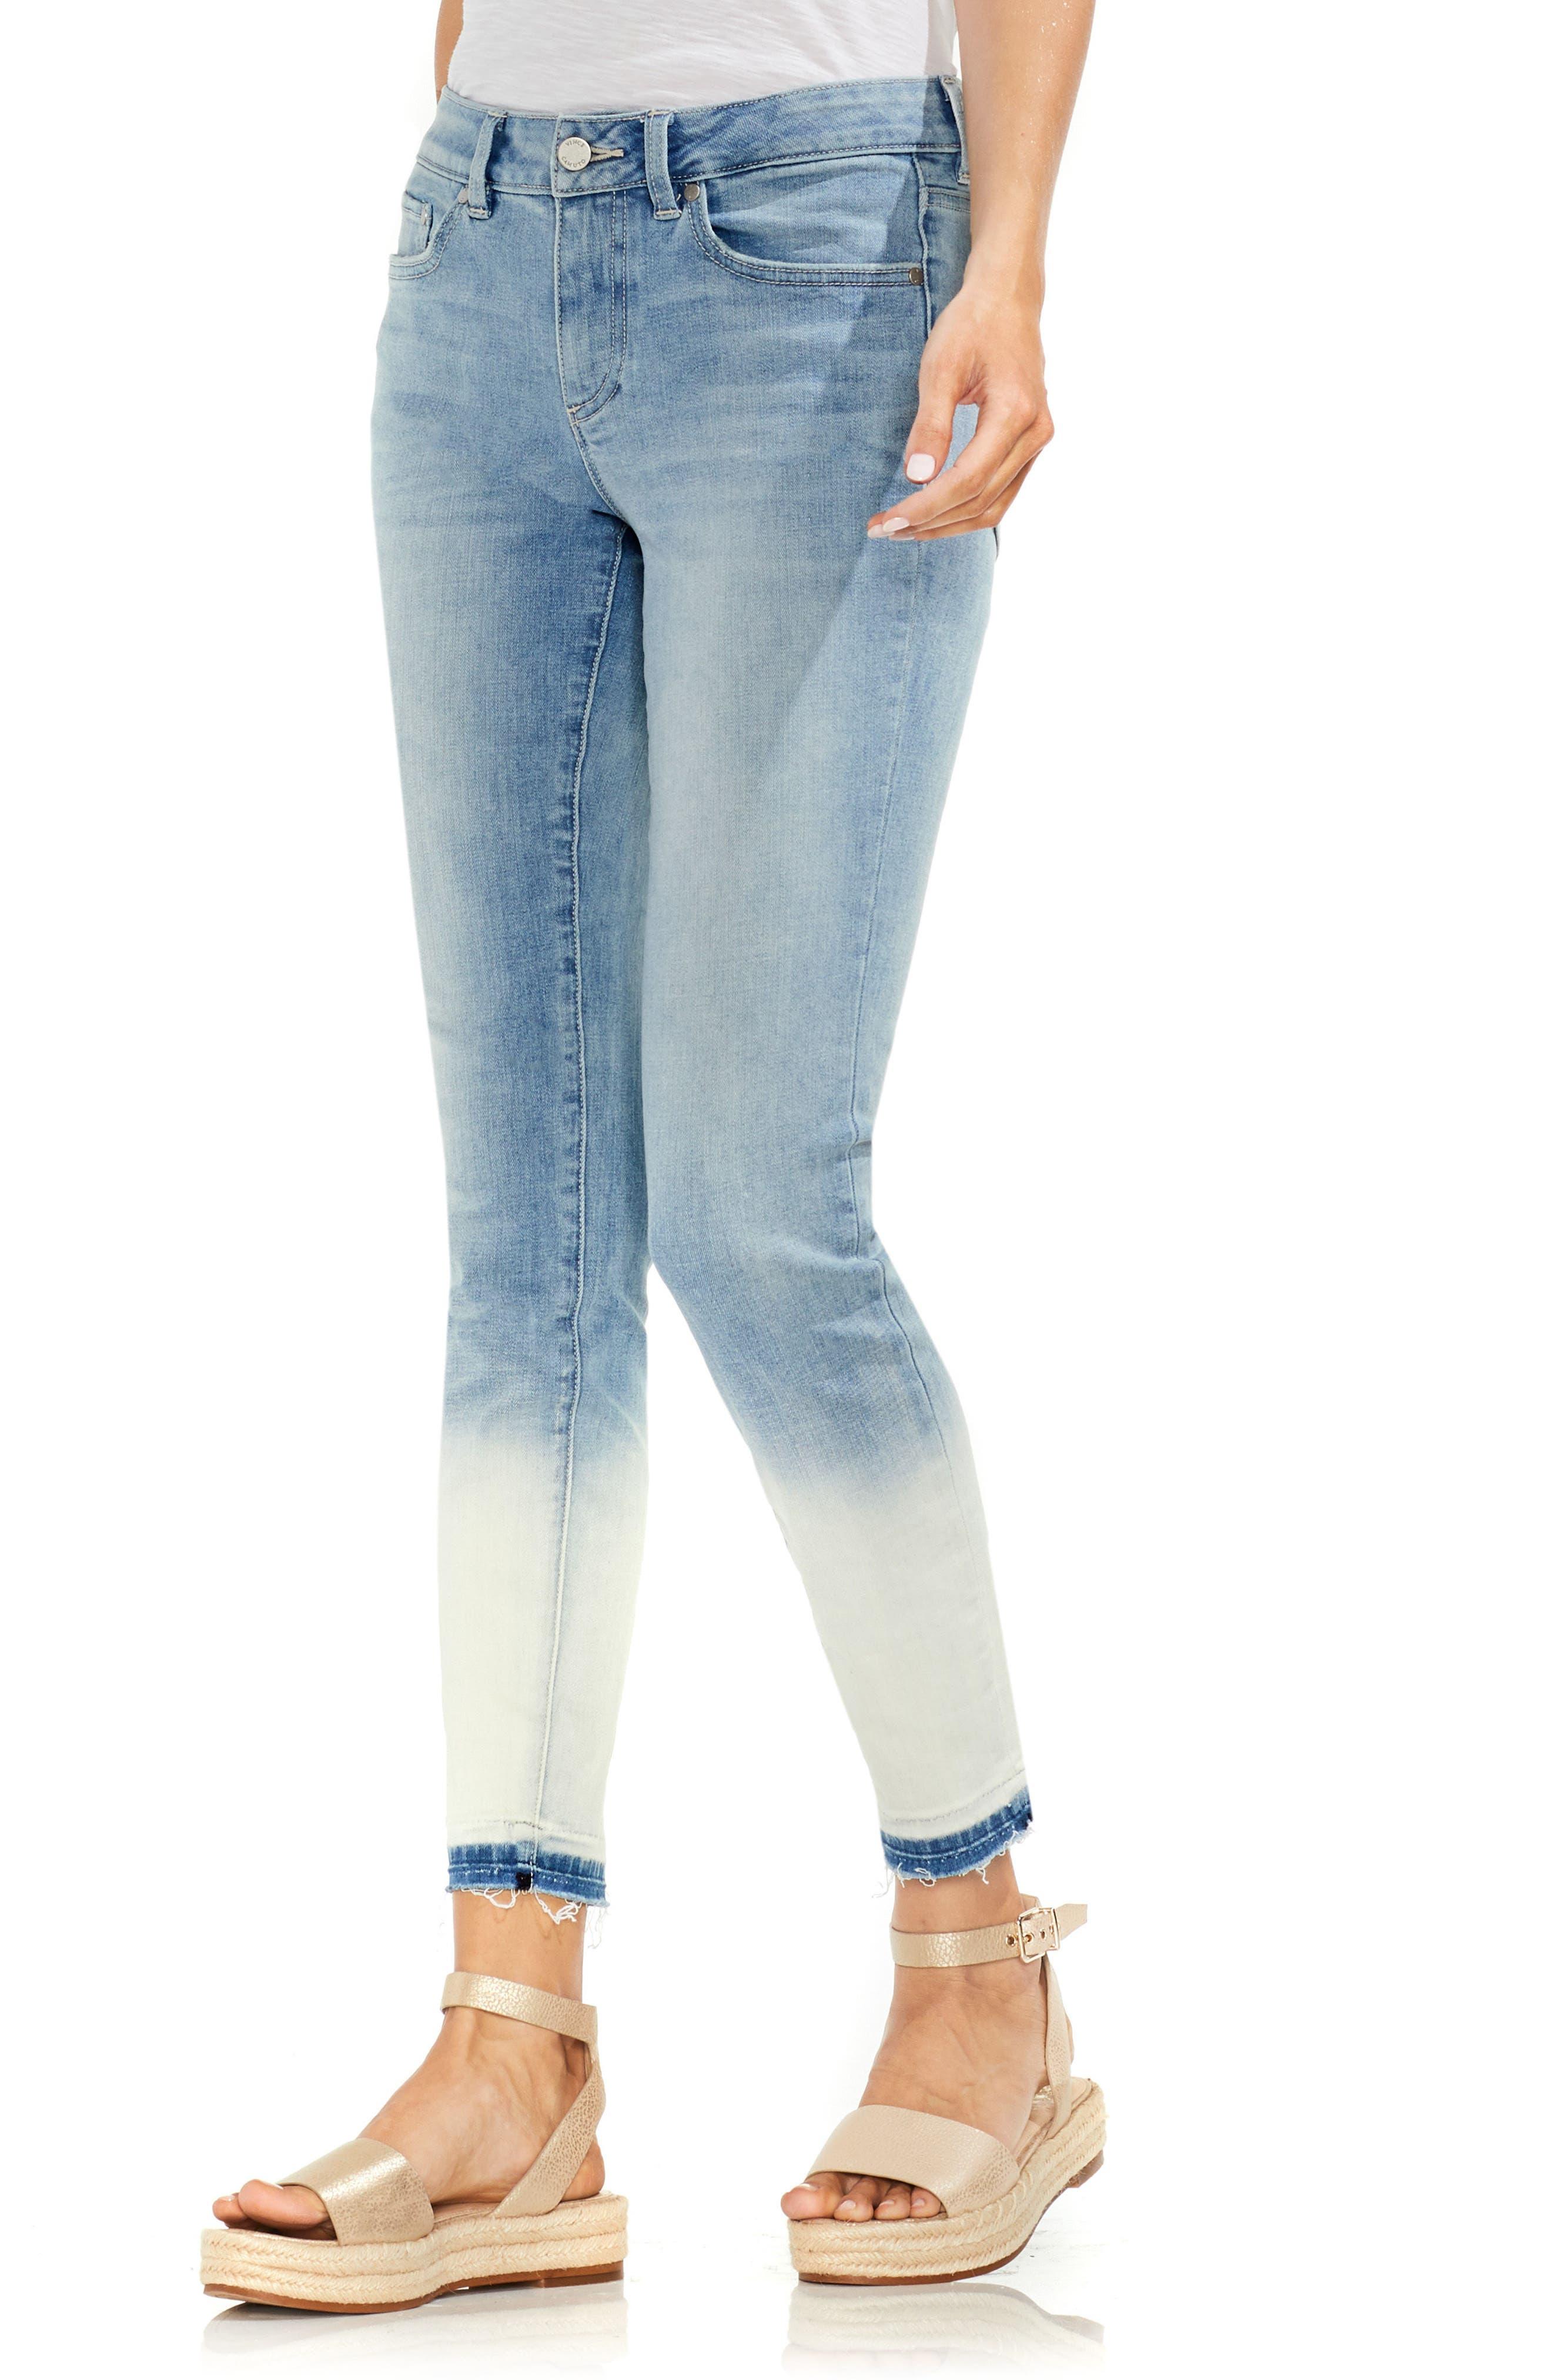 Vince Camuto Ombré Release Hem Skinny Ankle Jeans (Sun Wash Blue)